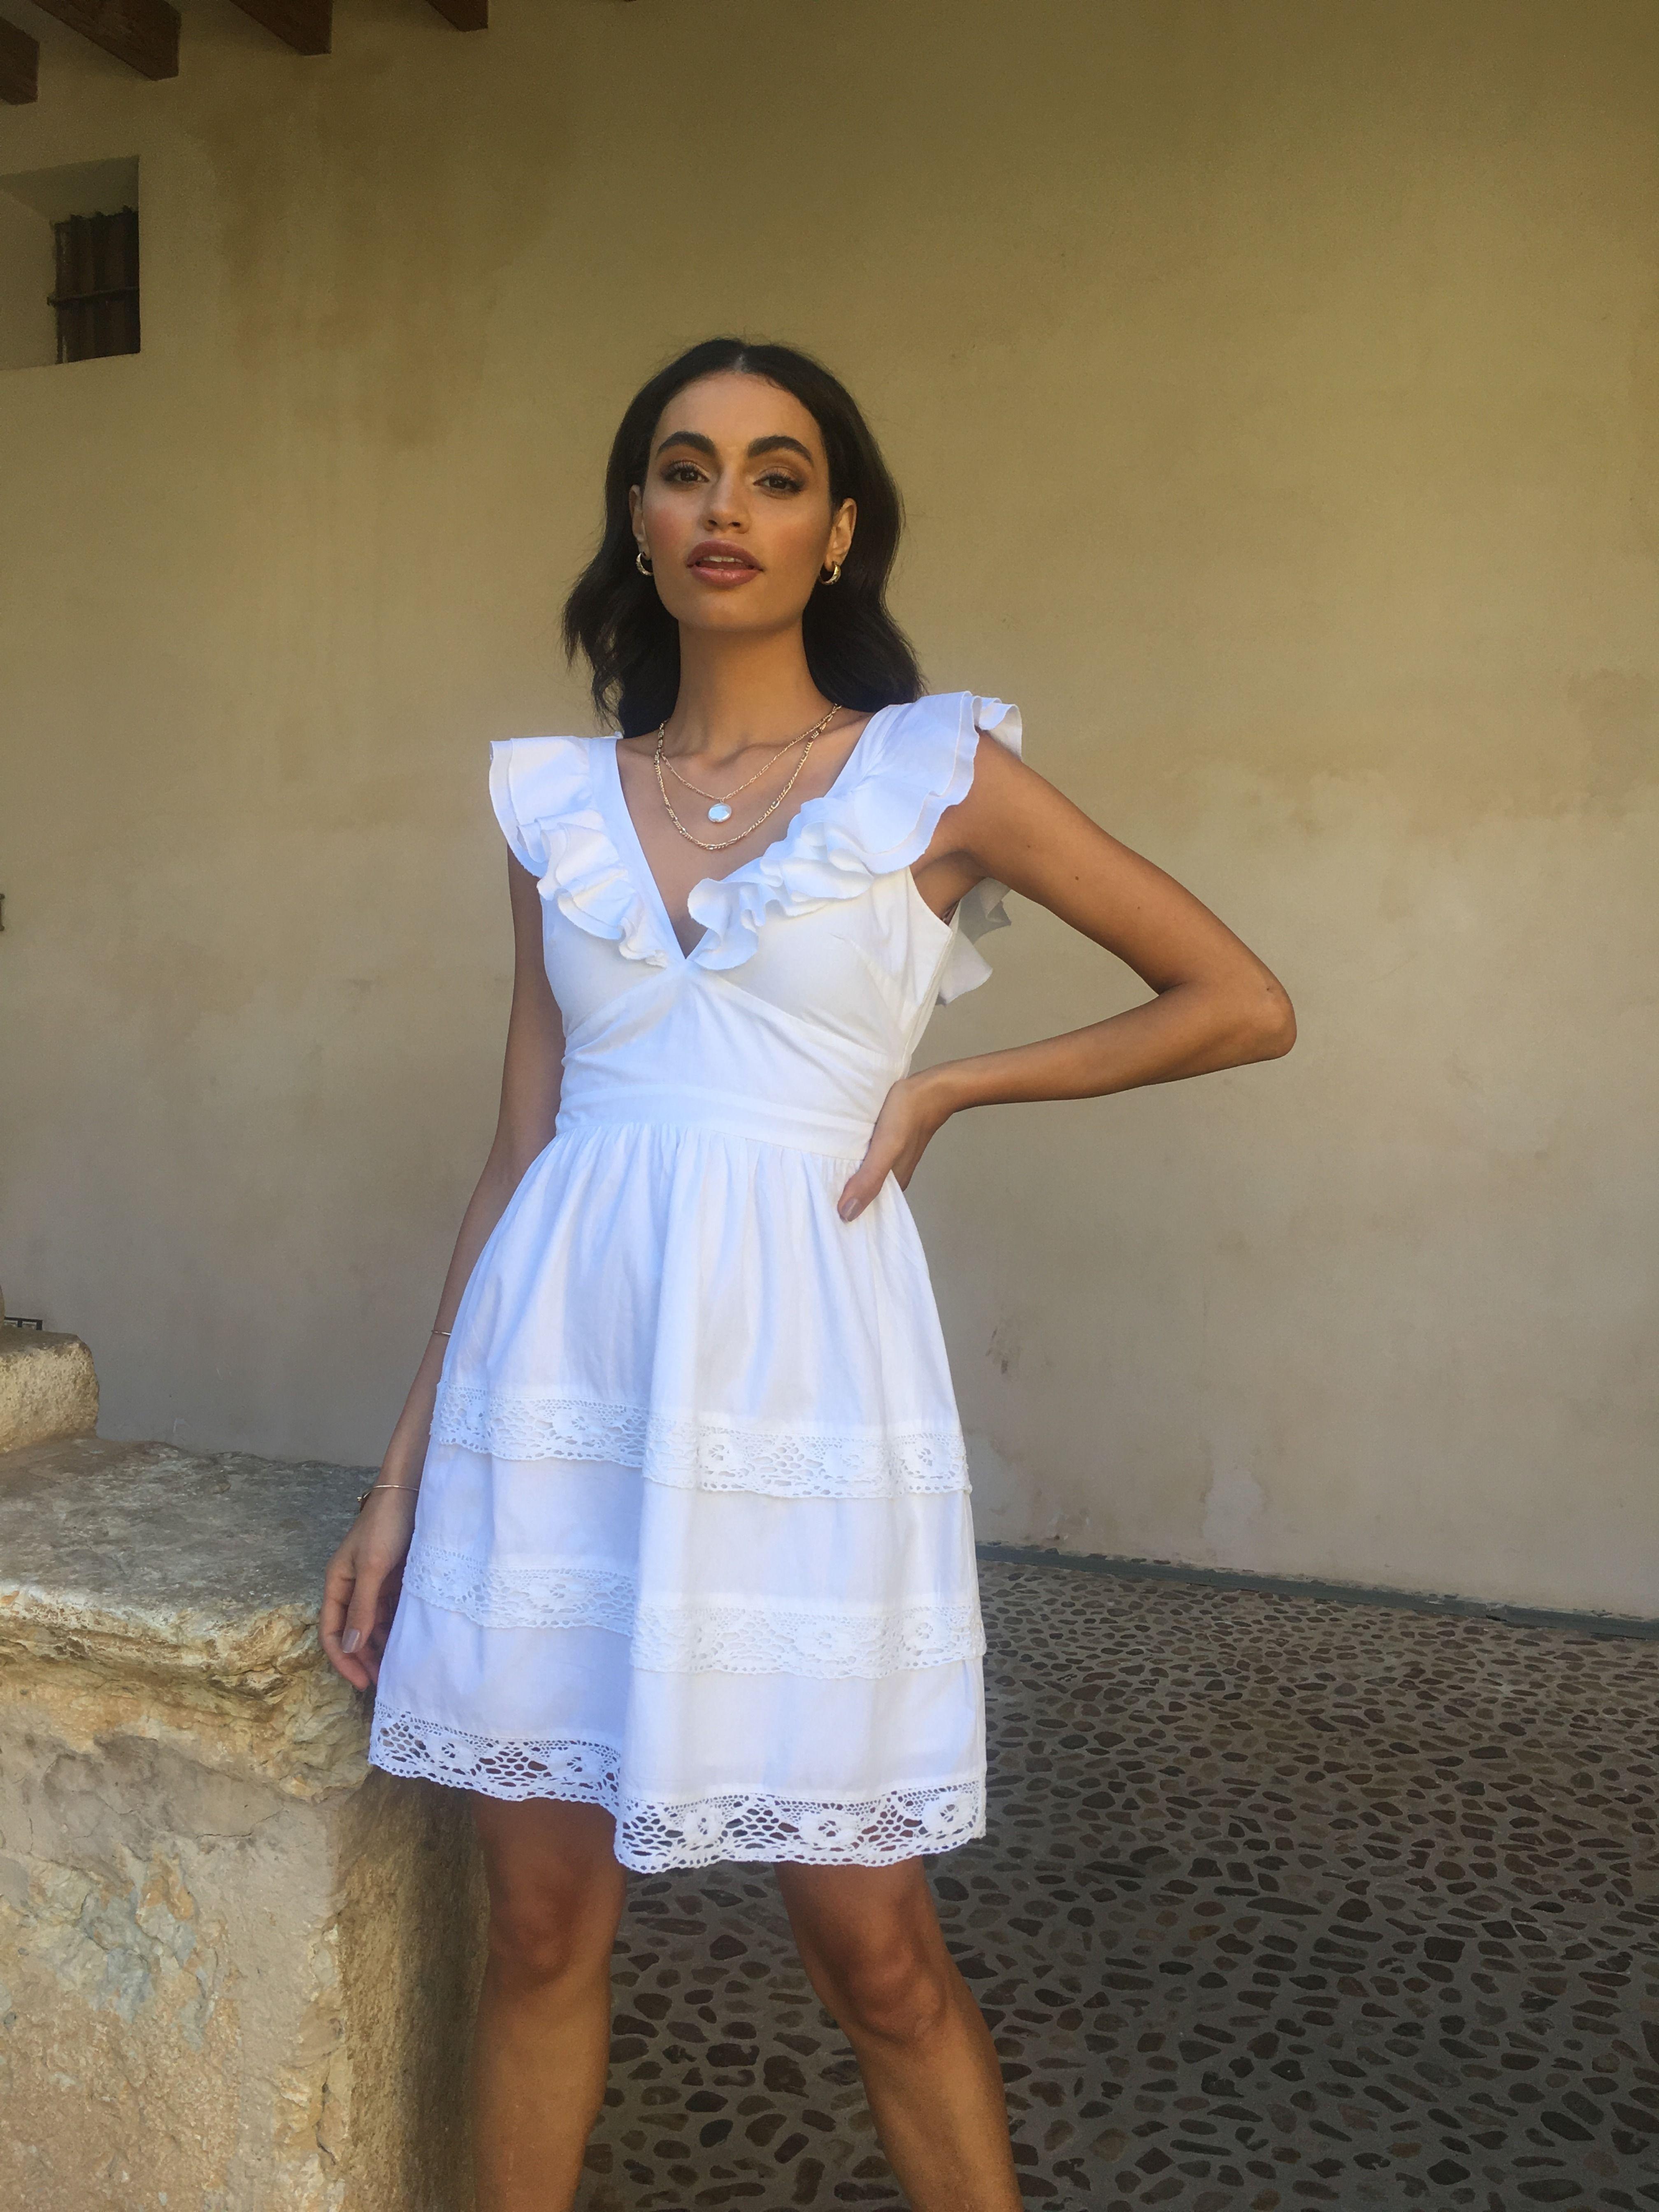 Tie Back Layered Flounce Dress Flounced Dress Dresses White Dress [ 5376 x 4032 Pixel ]